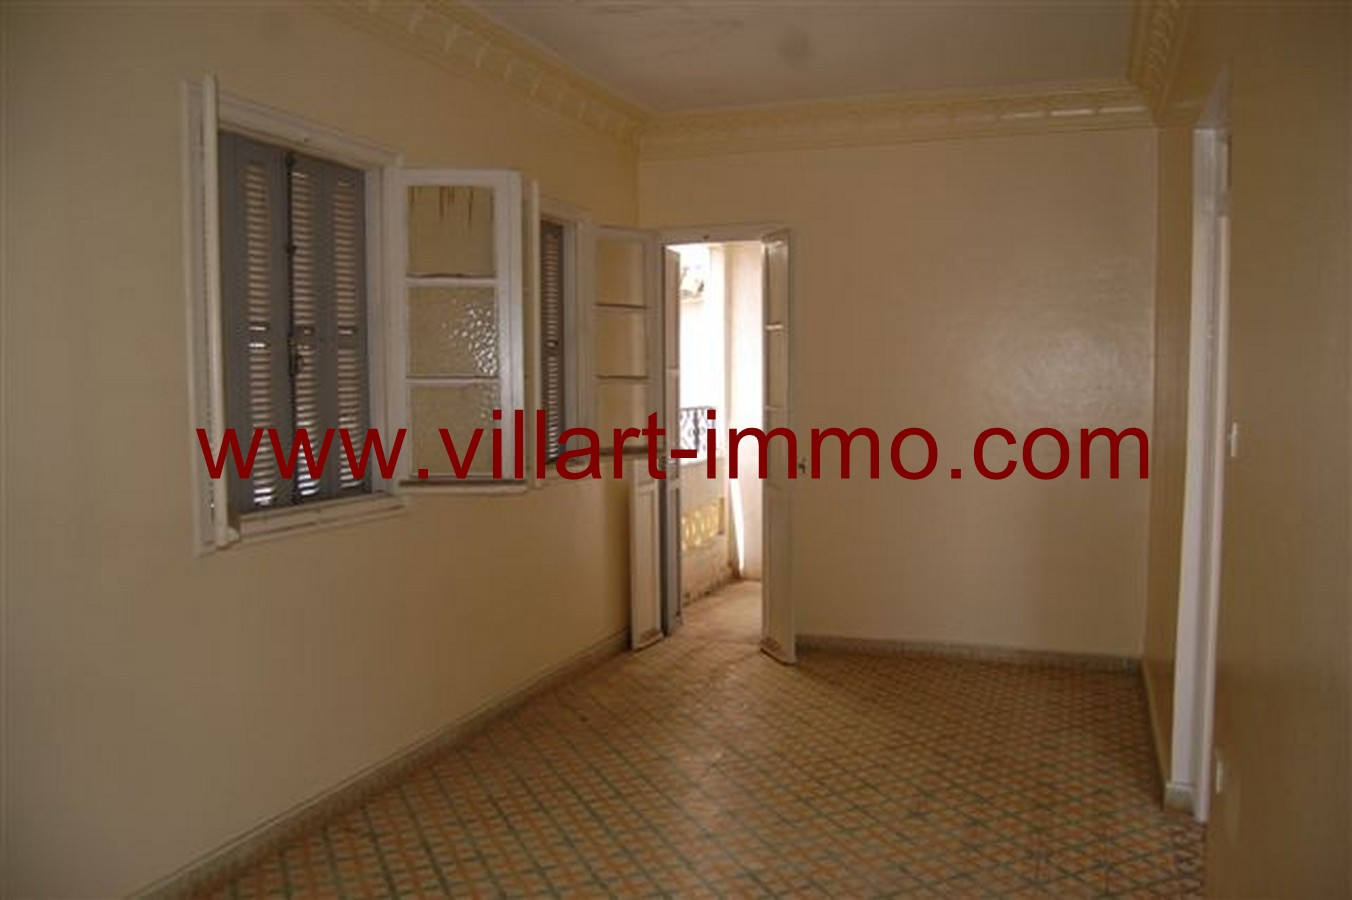 6-Vente-Appartement-Tanger-Chambre -VA532-Jirari-Villart Immo